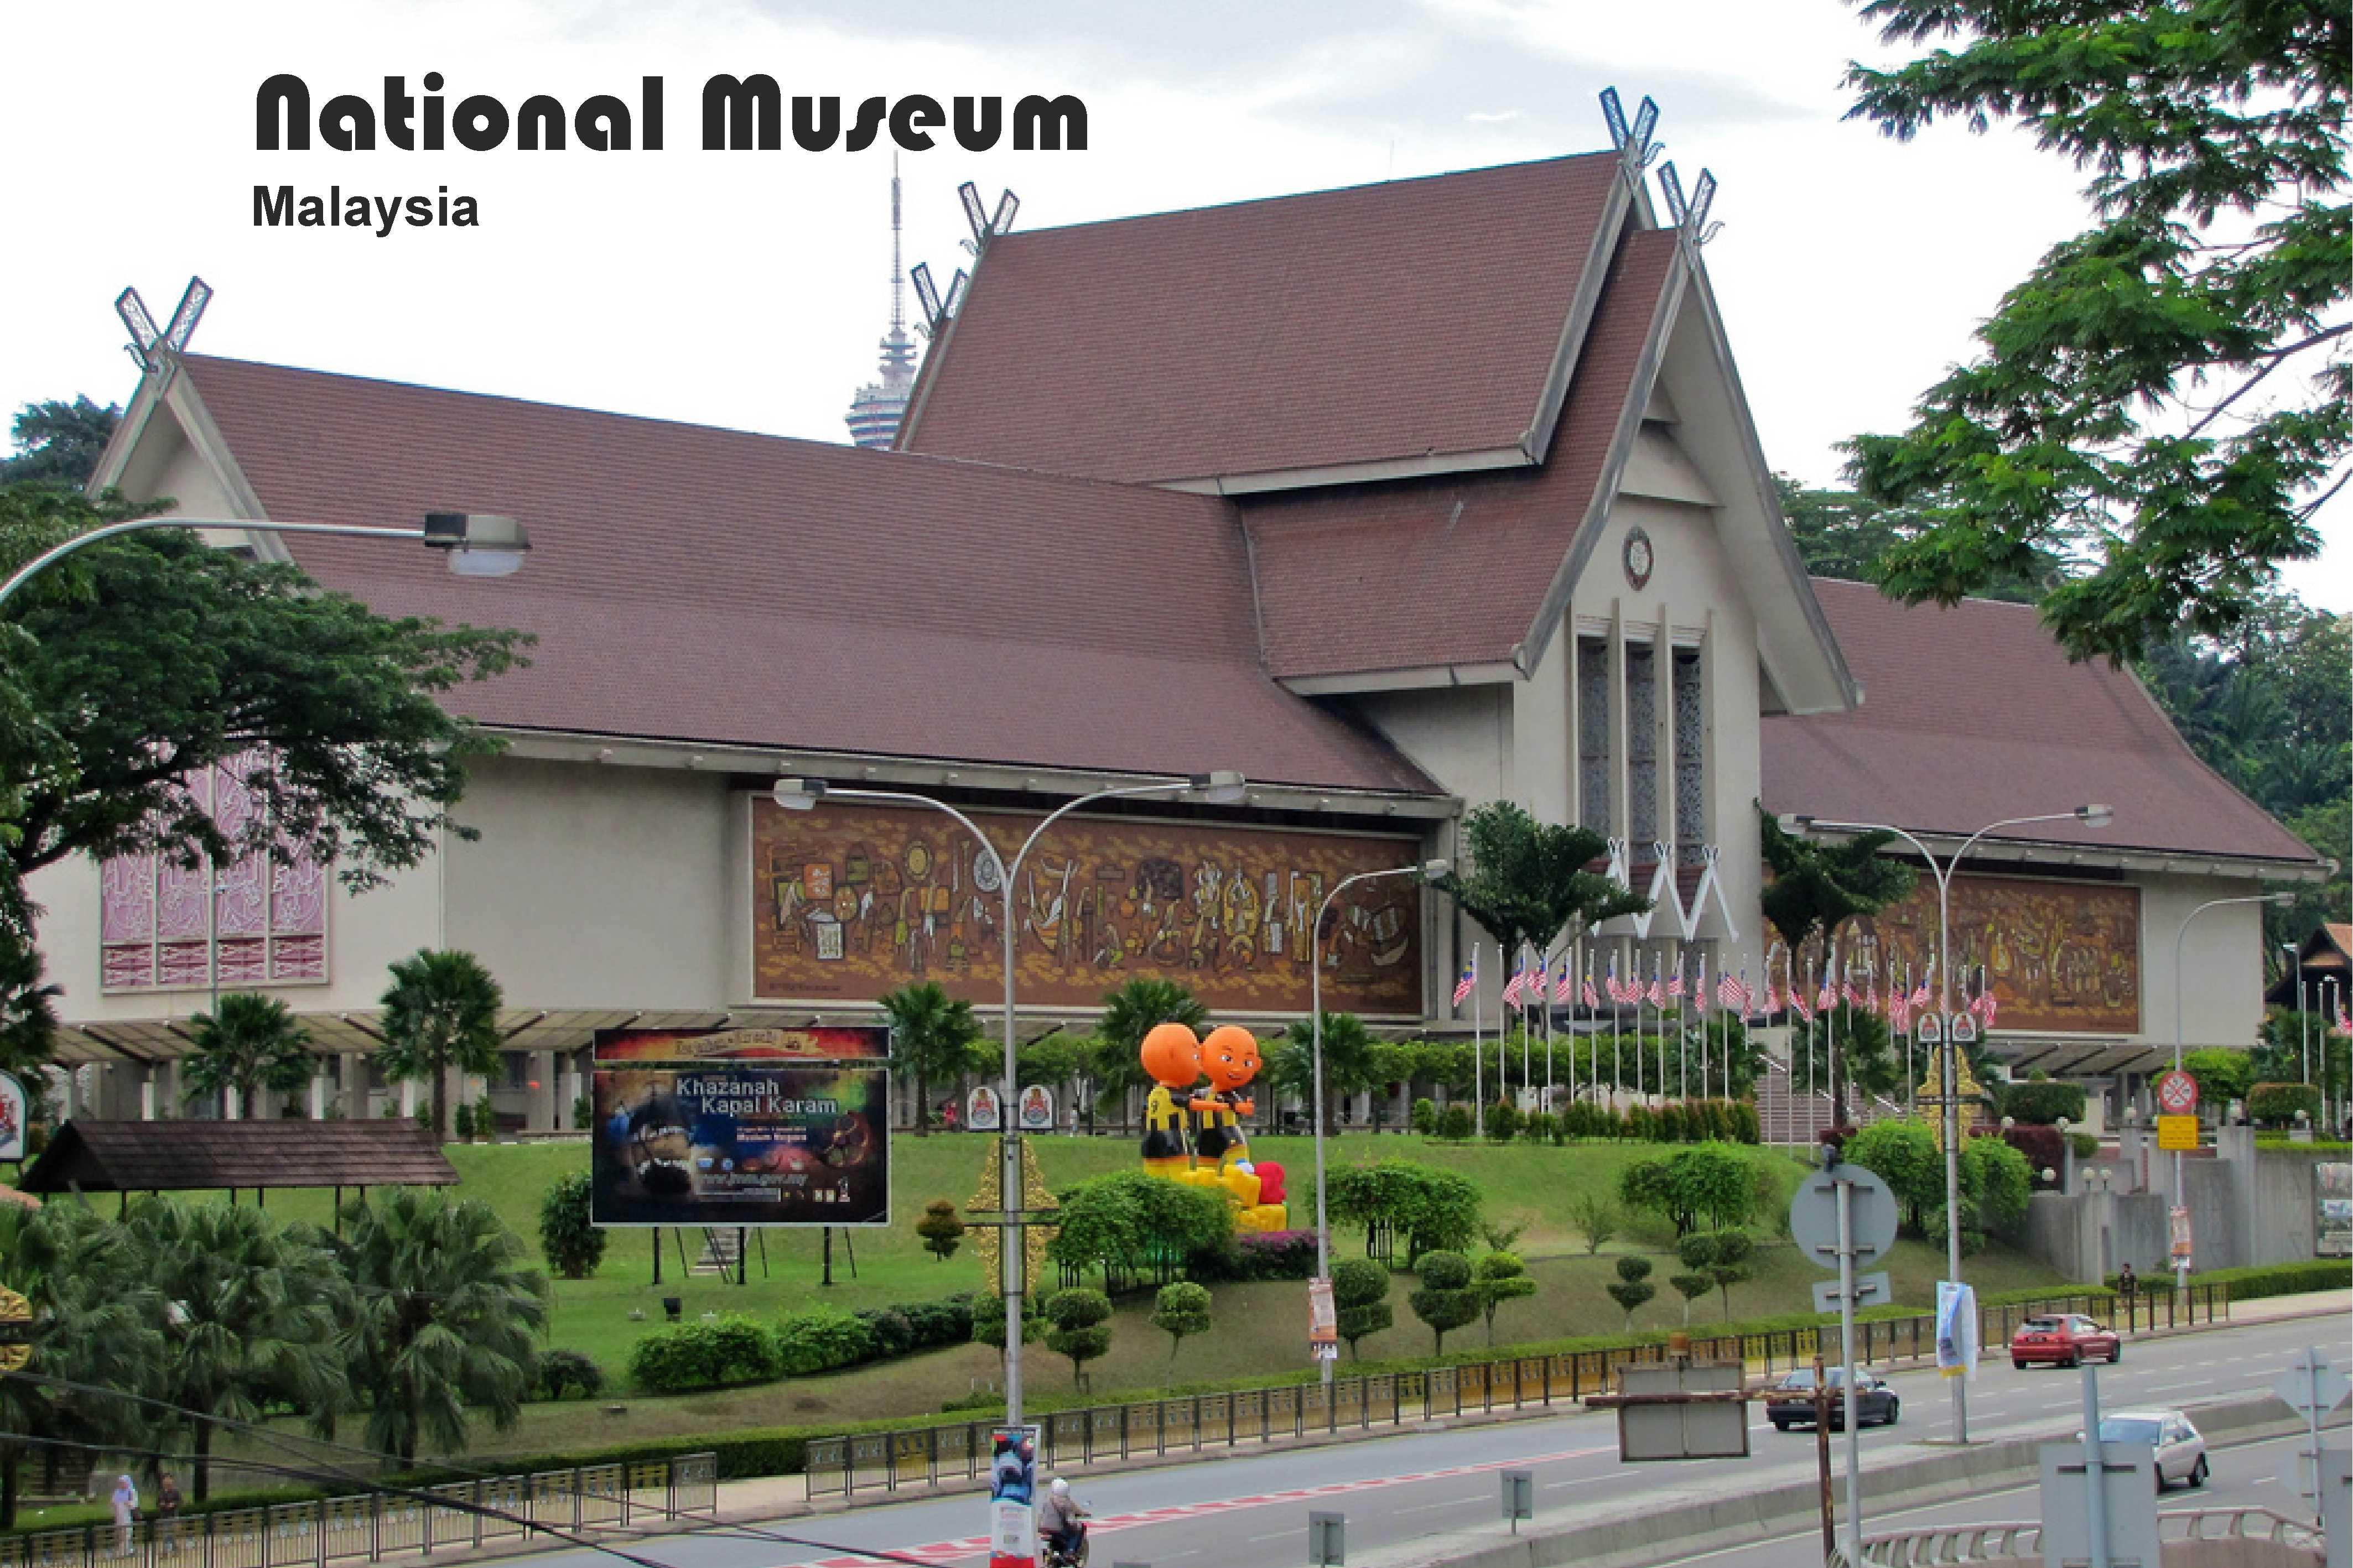 National Museum Malaysia